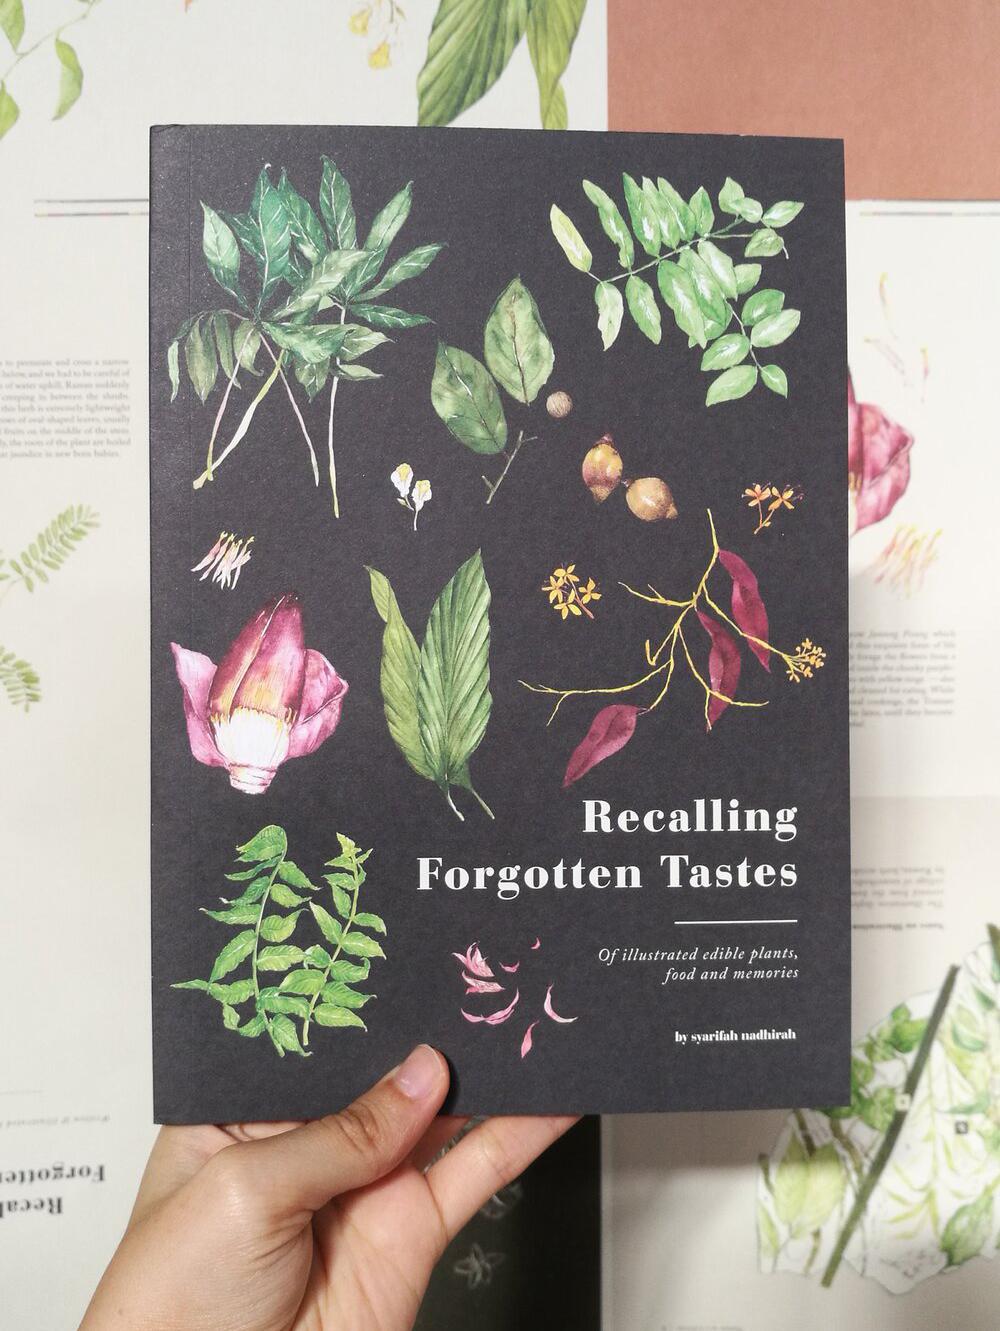 Recalling Forgotten Tastes book cover